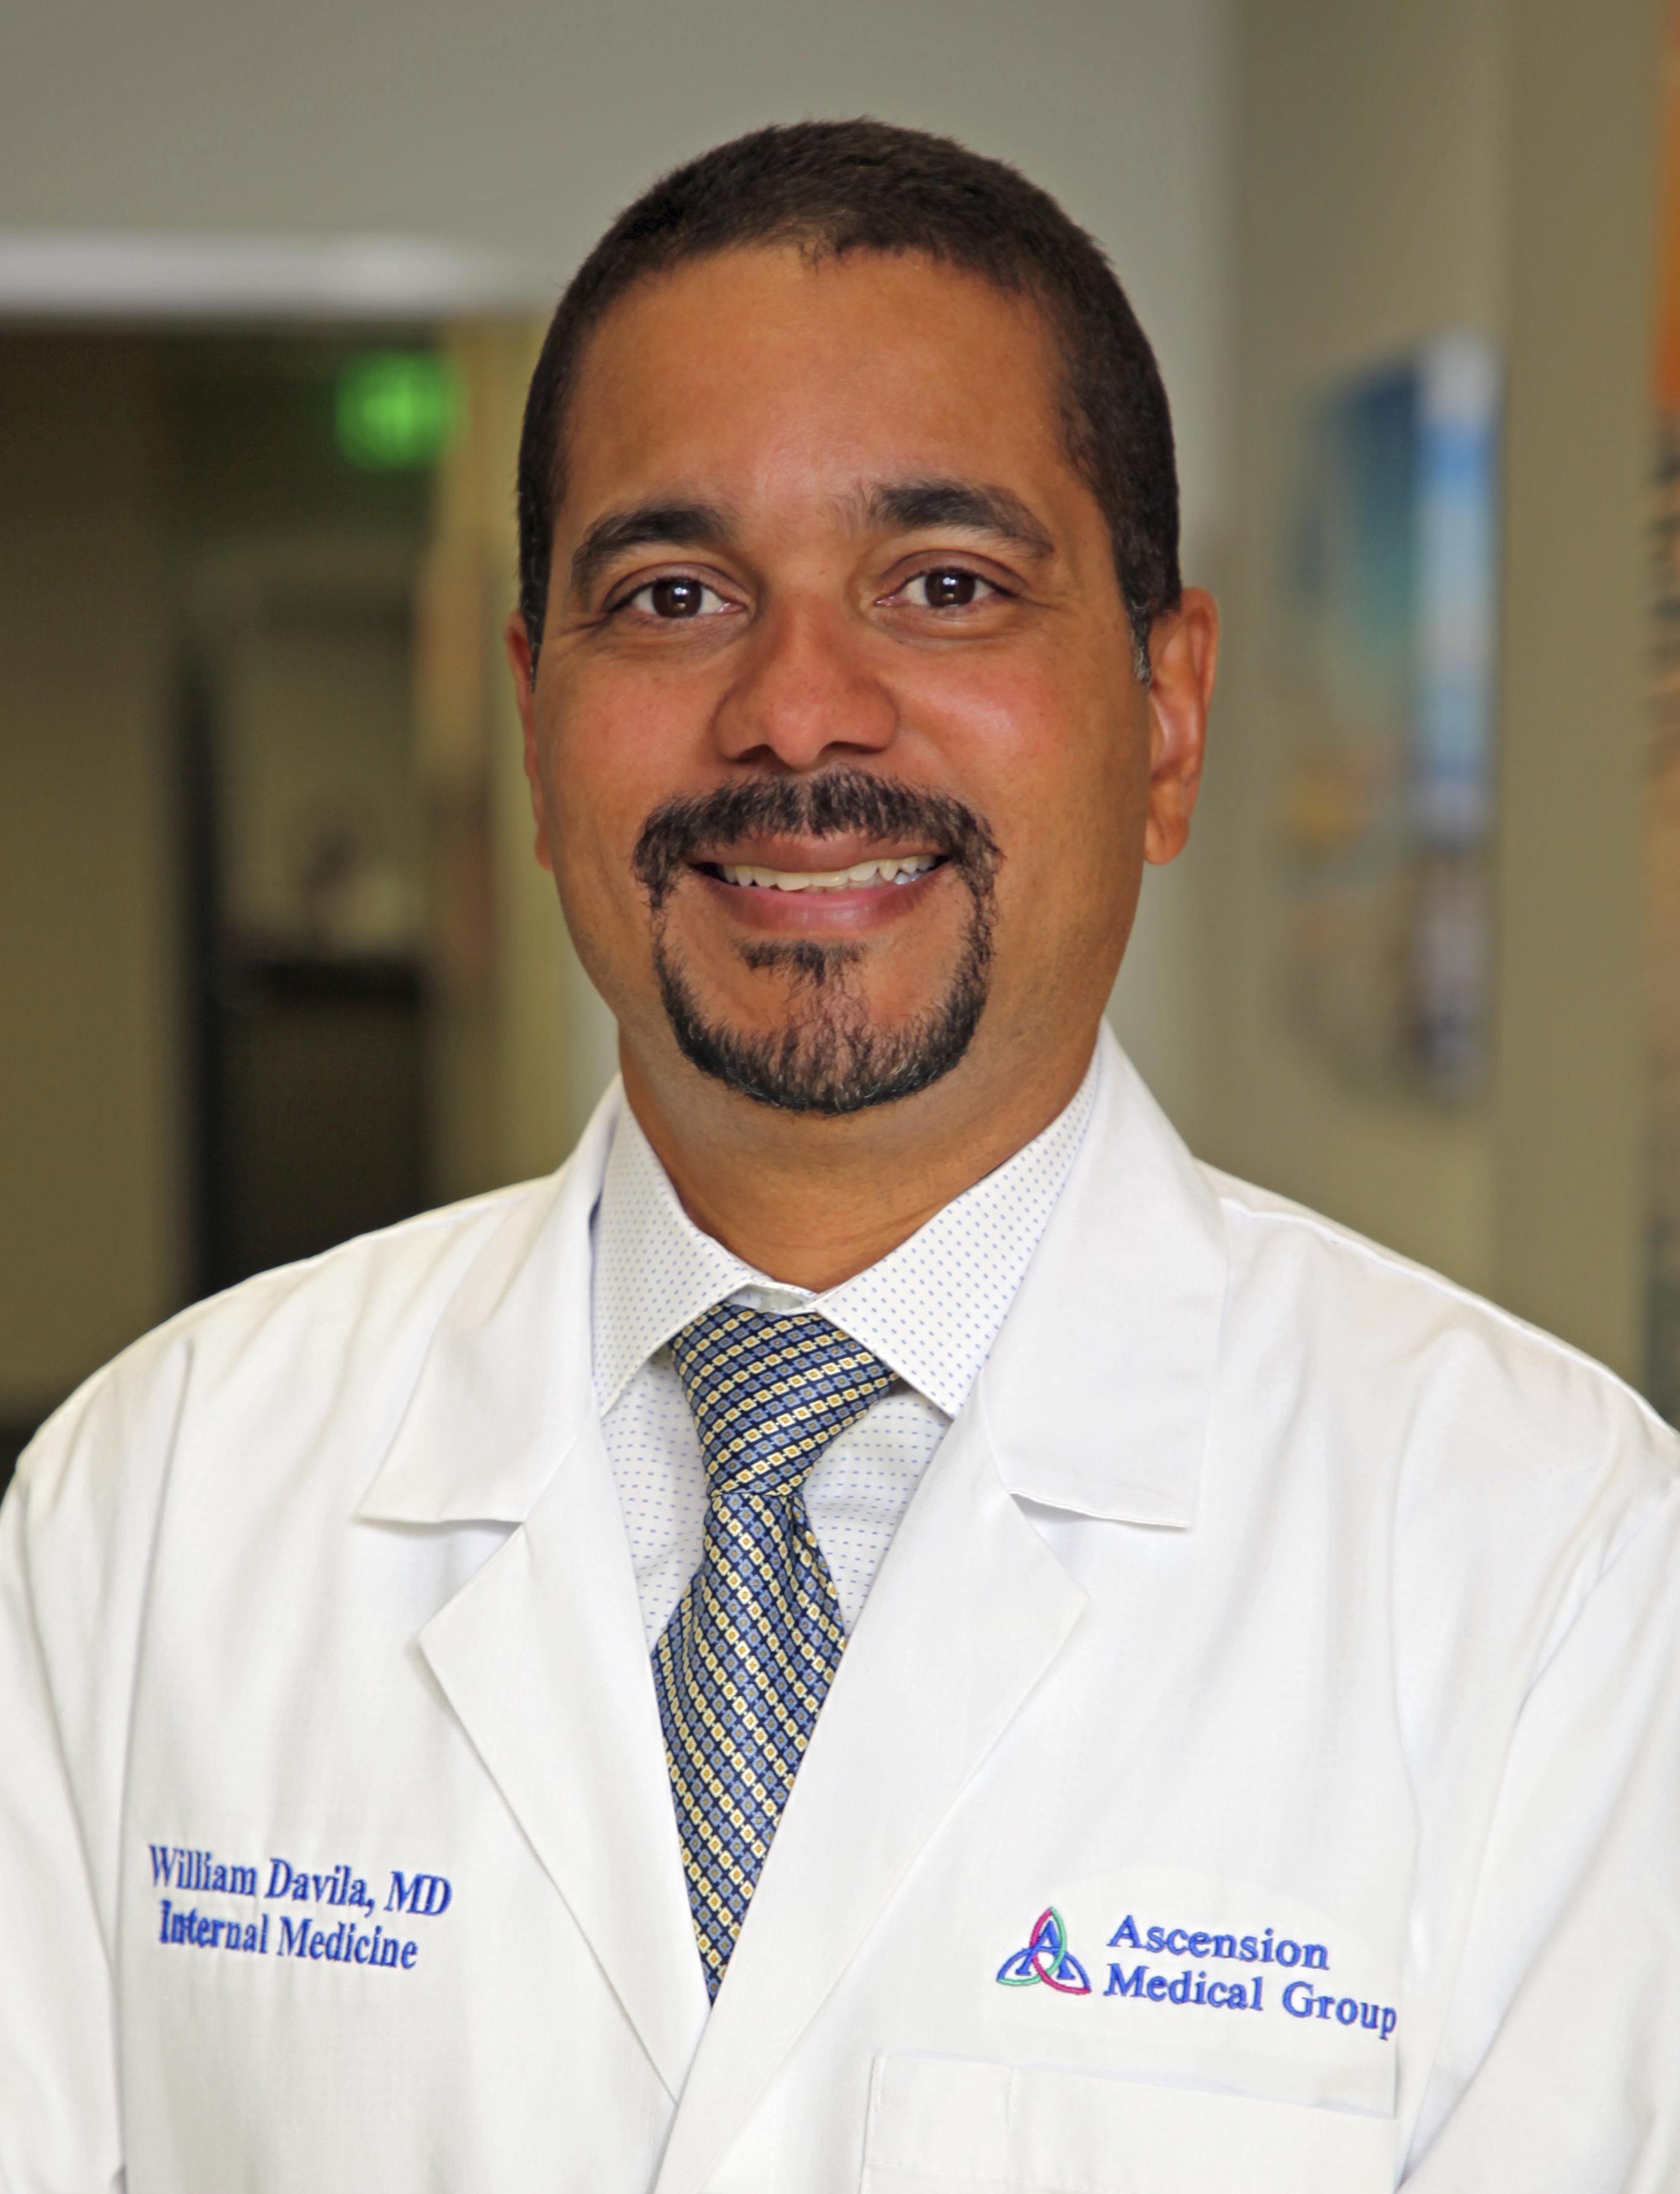 William J. Davila, MD